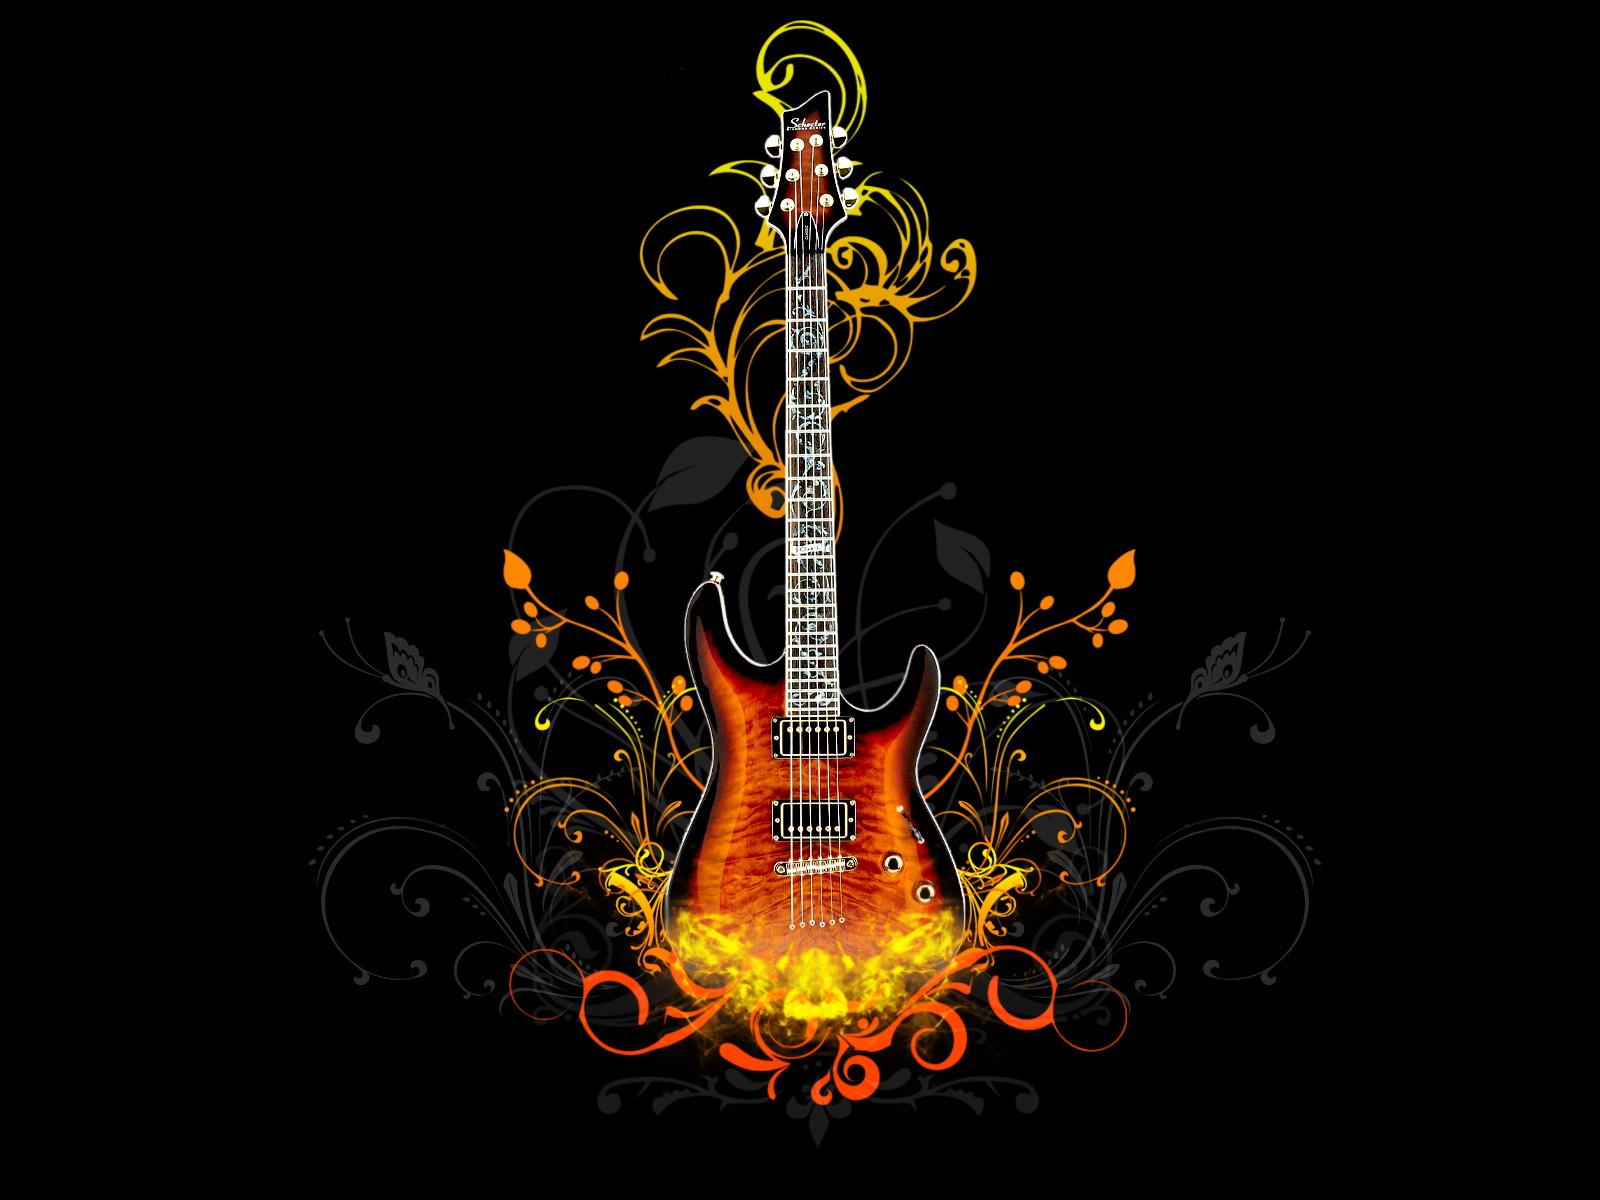 http://4.bp.blogspot.com/_eAPkYd-VWQA/SxVecGsAiNI/AAAAAAAAAI8/PQYj_w_WHFo/s1600/Guitar%20Wallpaper%20109.jpg